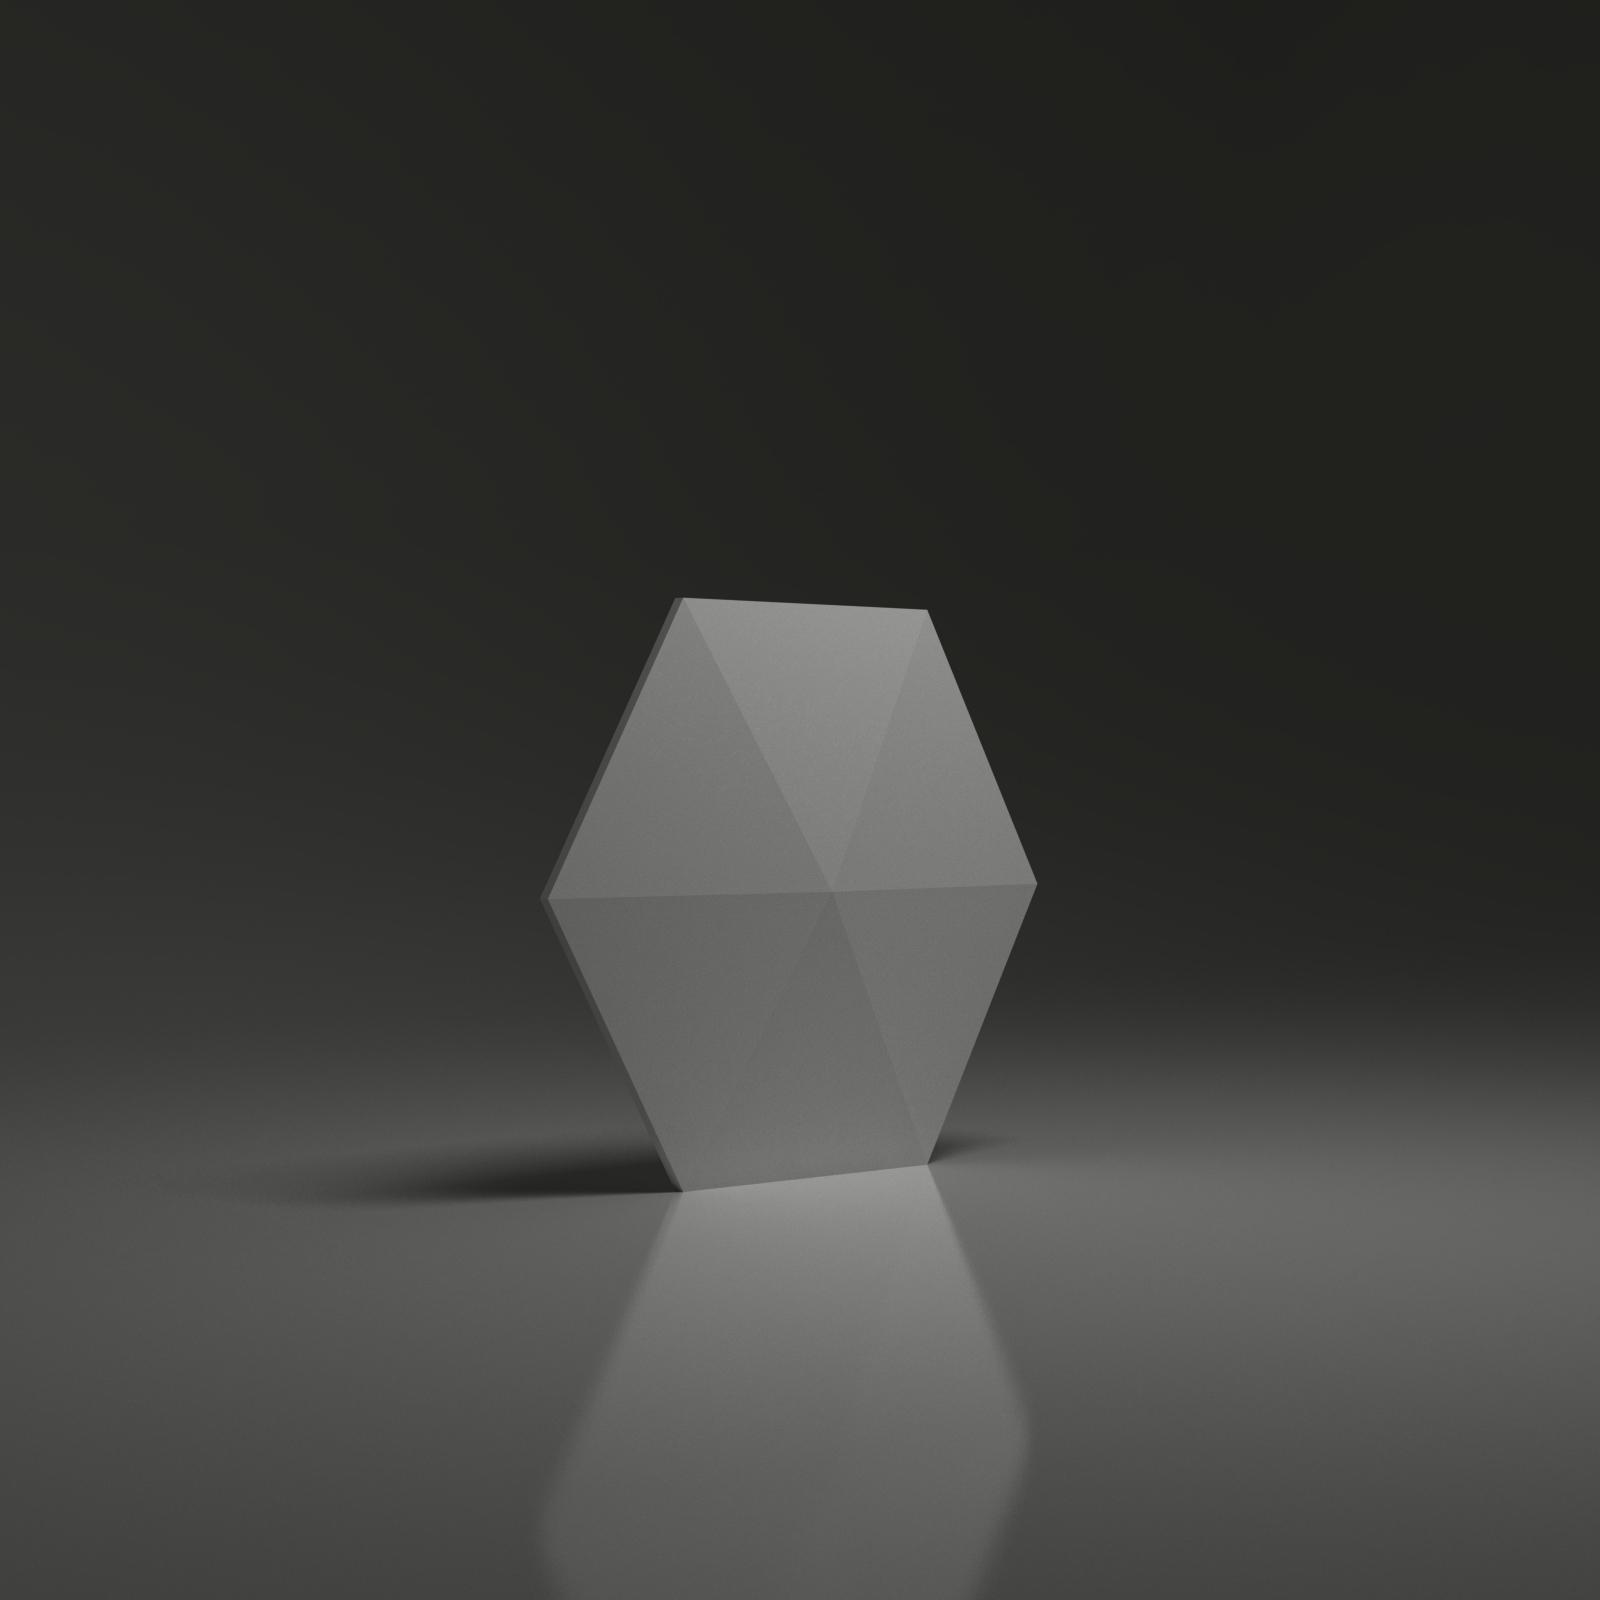 hexagon-point-wizu